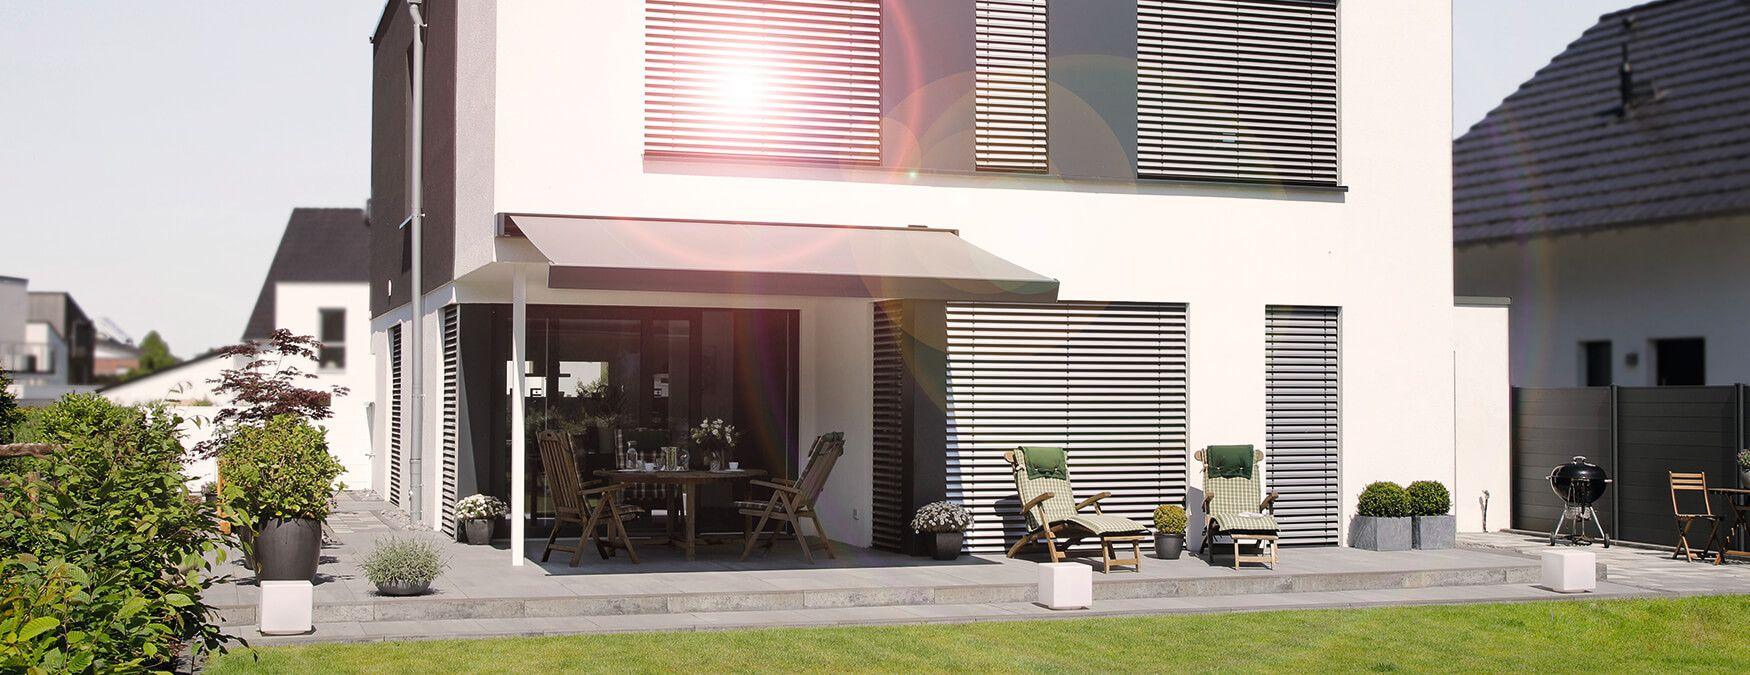 home jellinghaus raumgestaltung sonnenschutz gmbh. Black Bedroom Furniture Sets. Home Design Ideas